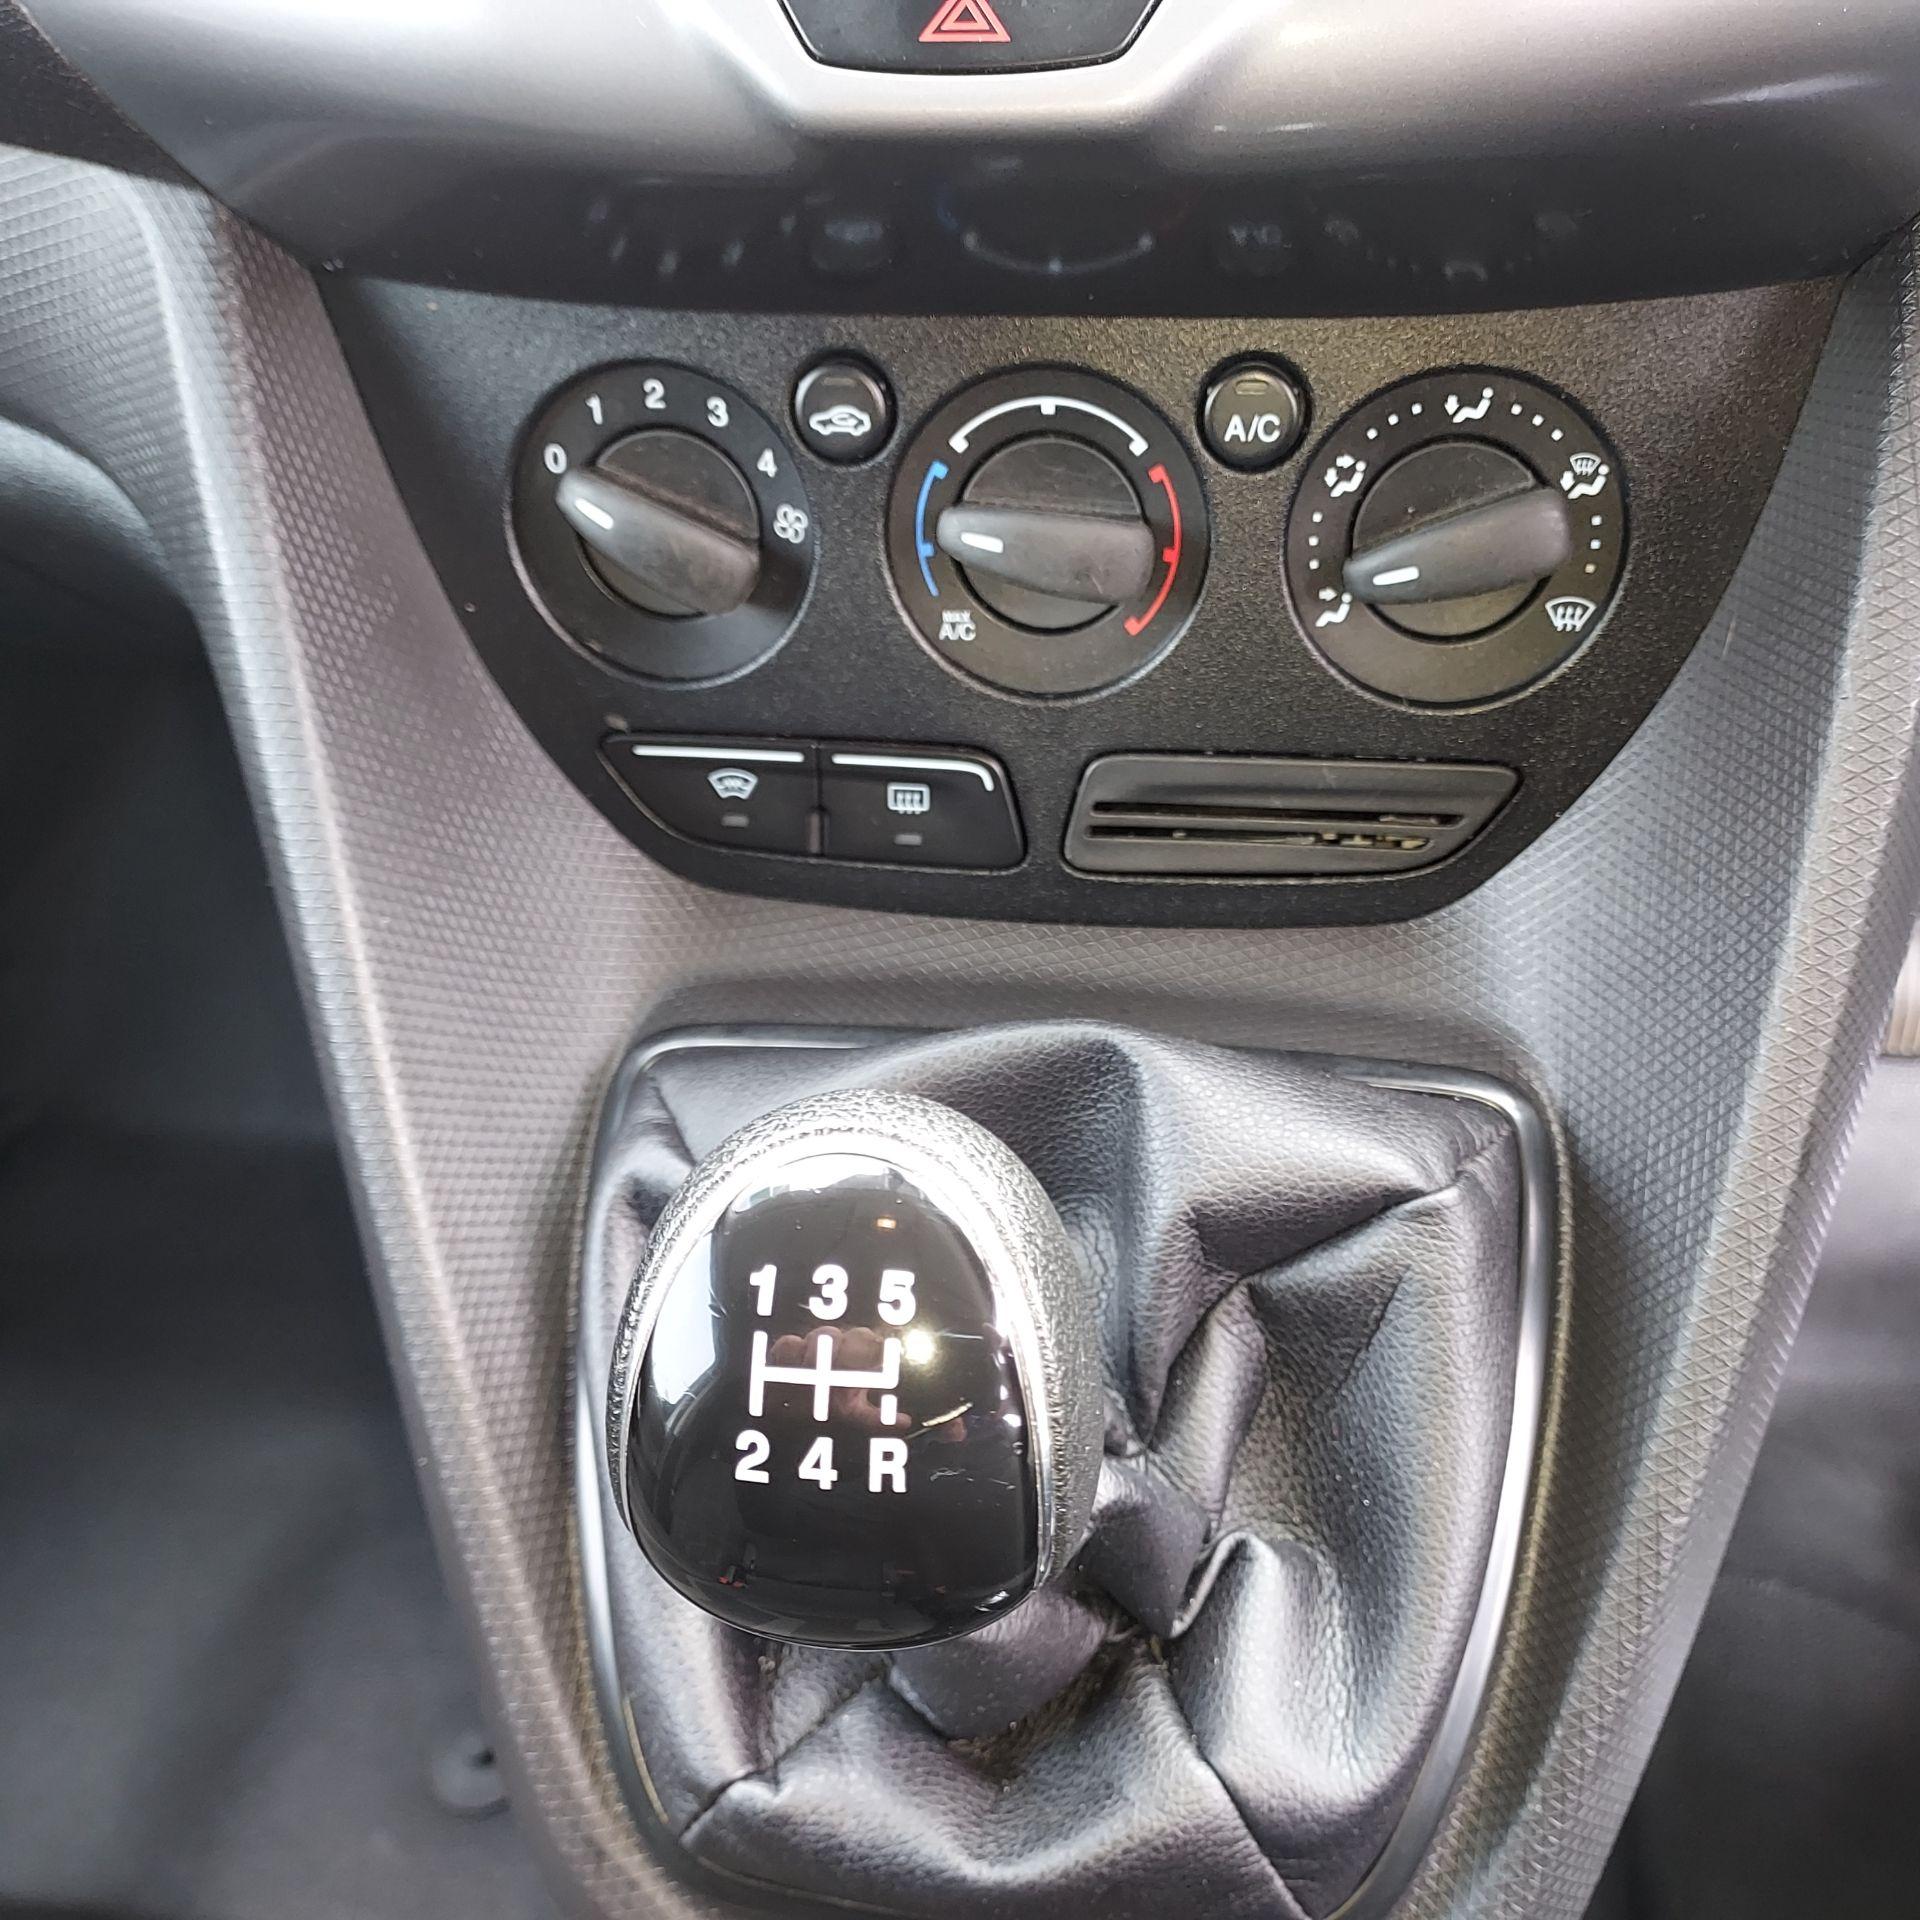 2018 Ford Transit Connect LWB Trend 1.5TD 100PS 5SPD 3DR (181D27007) Image 10